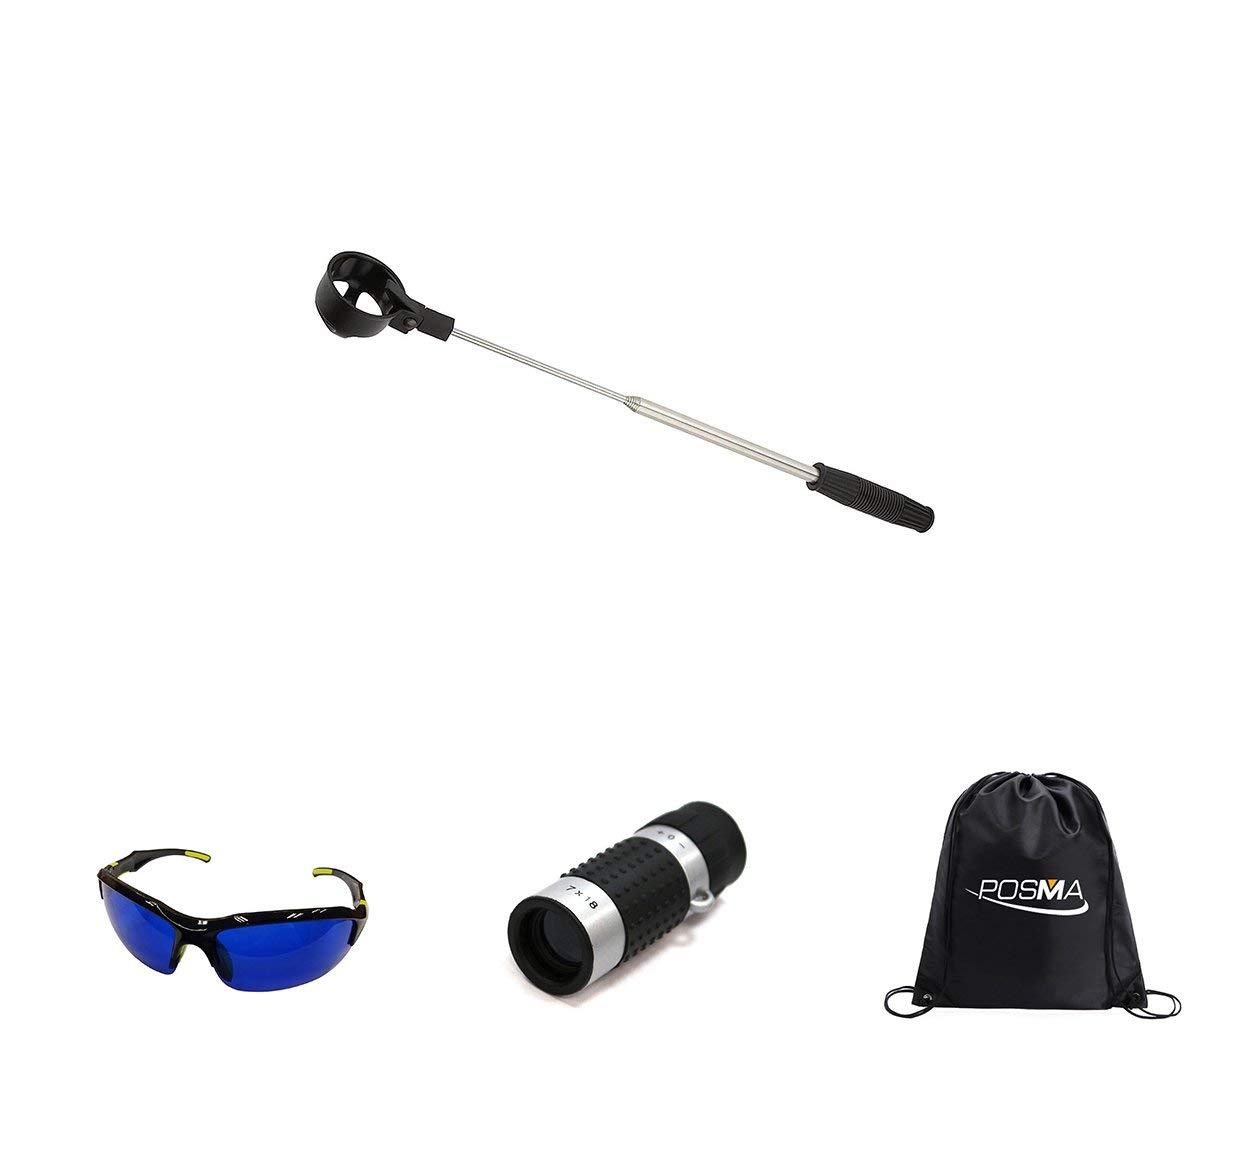 POSMA BR050K Golf 5 section Retrectable 2m Golf Ball Retriever Bundle Set with 1pc Golf Ranger Finder(GF100) + 1pc Golf Ball Finder Hunter Retriever Glasses + 1pc black cinch sack carry bag